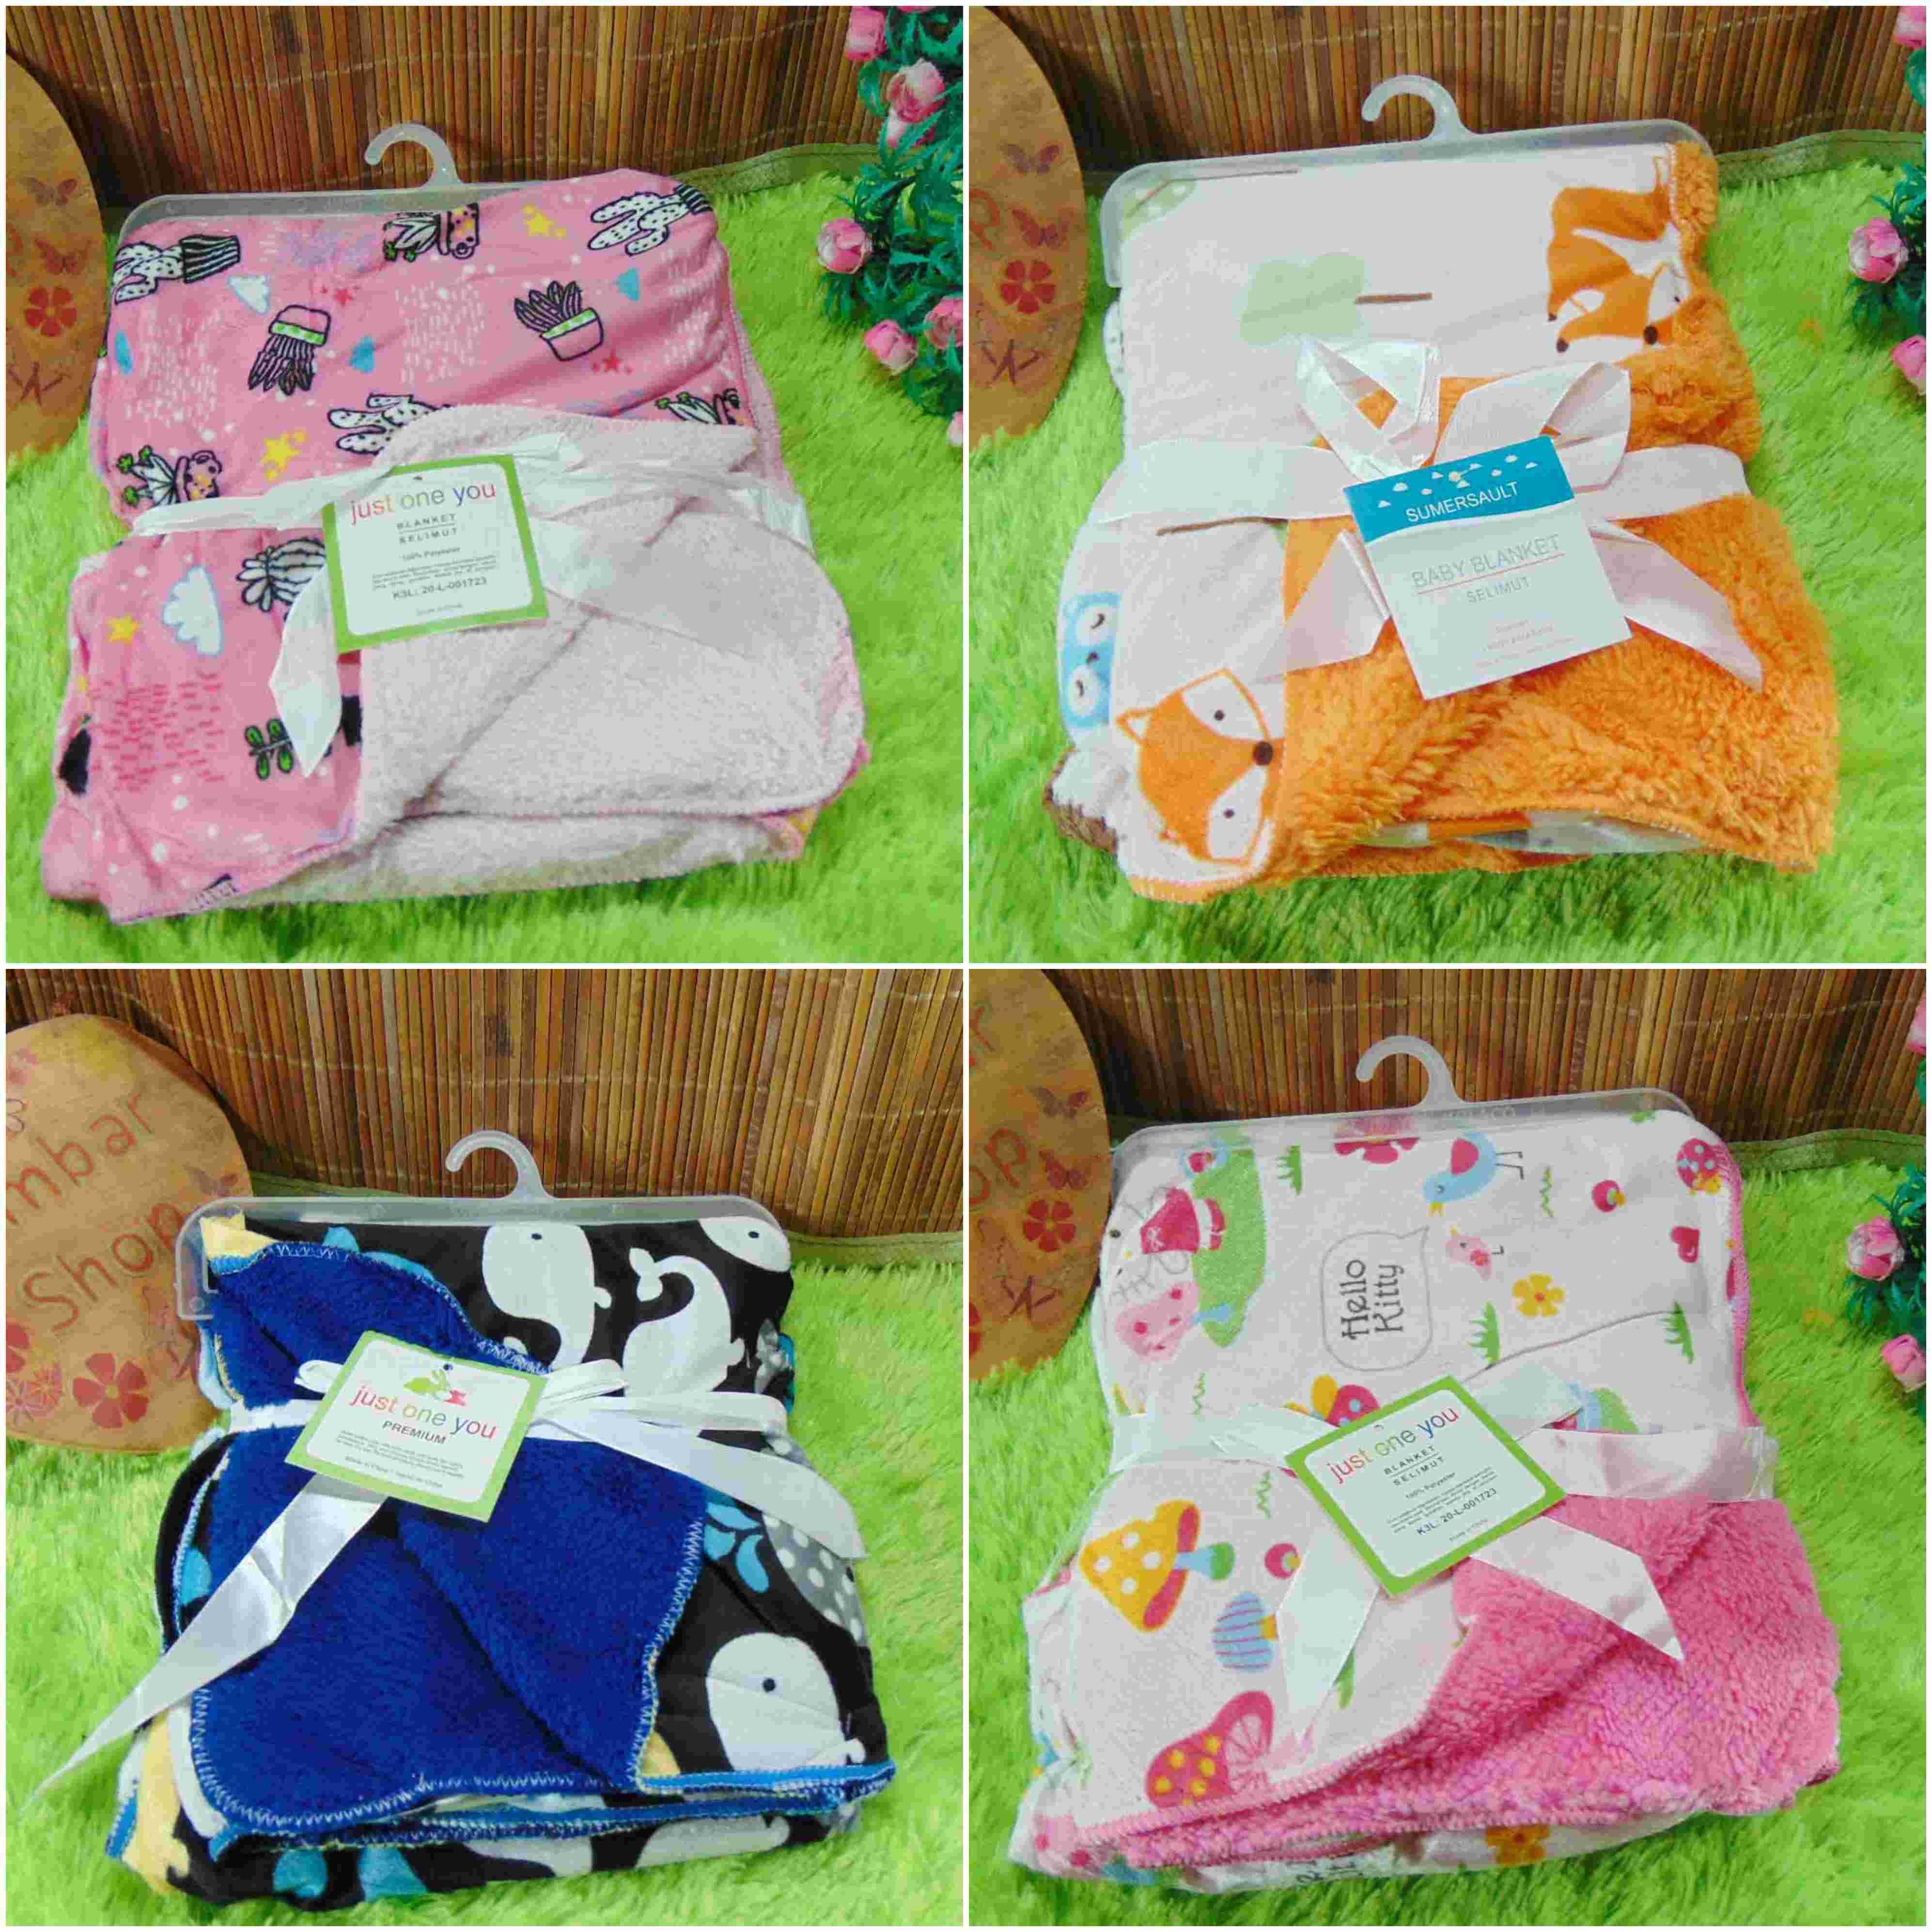 kado bayi baby gift selimut carter double fleece bayi aneka motif (3)